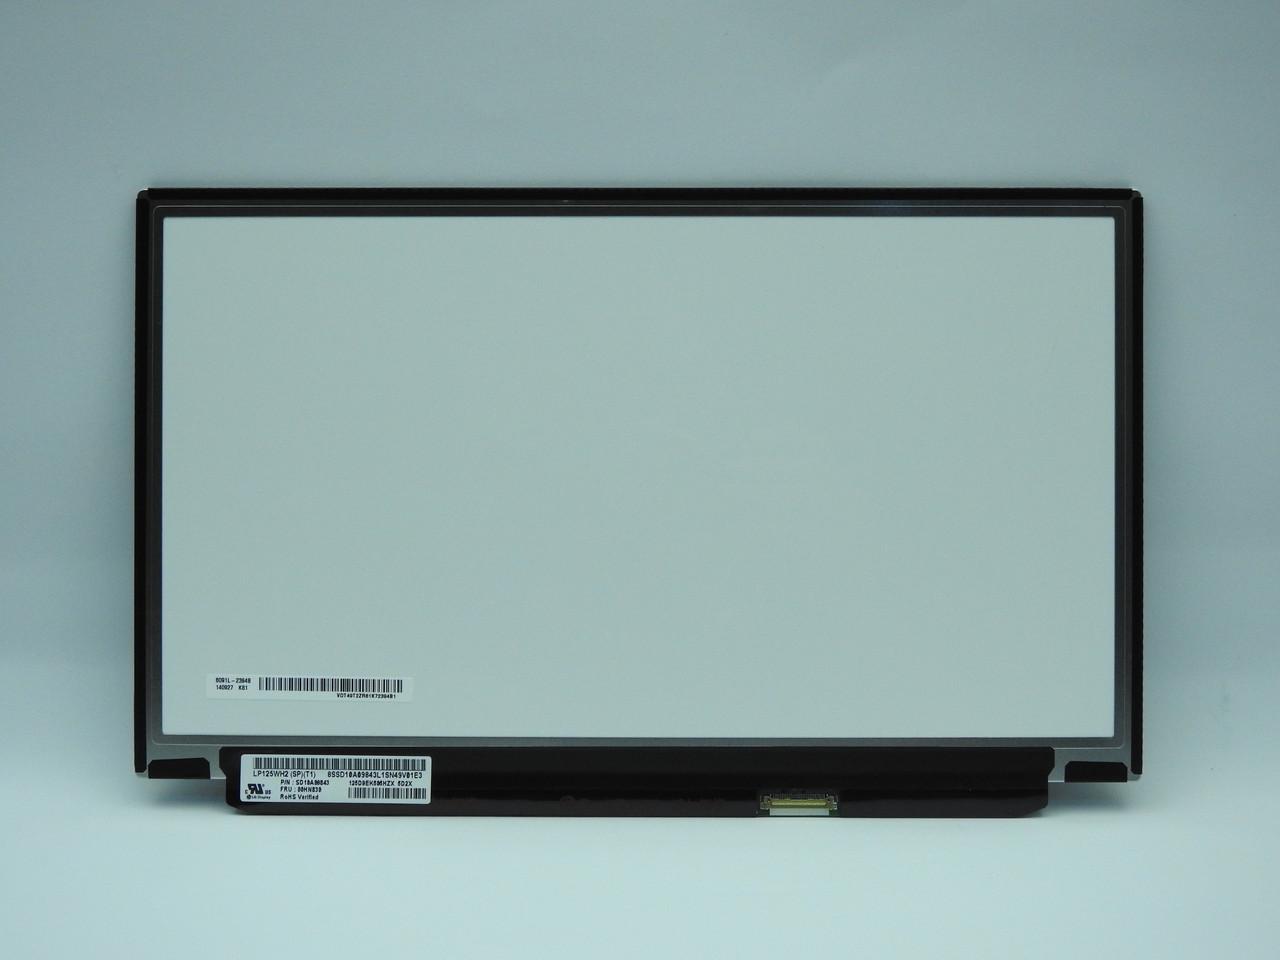 New. Матрица (дисплей) Lenovo X240 X240S HD IPS LP125WH2(SP)(T1) 00HN830